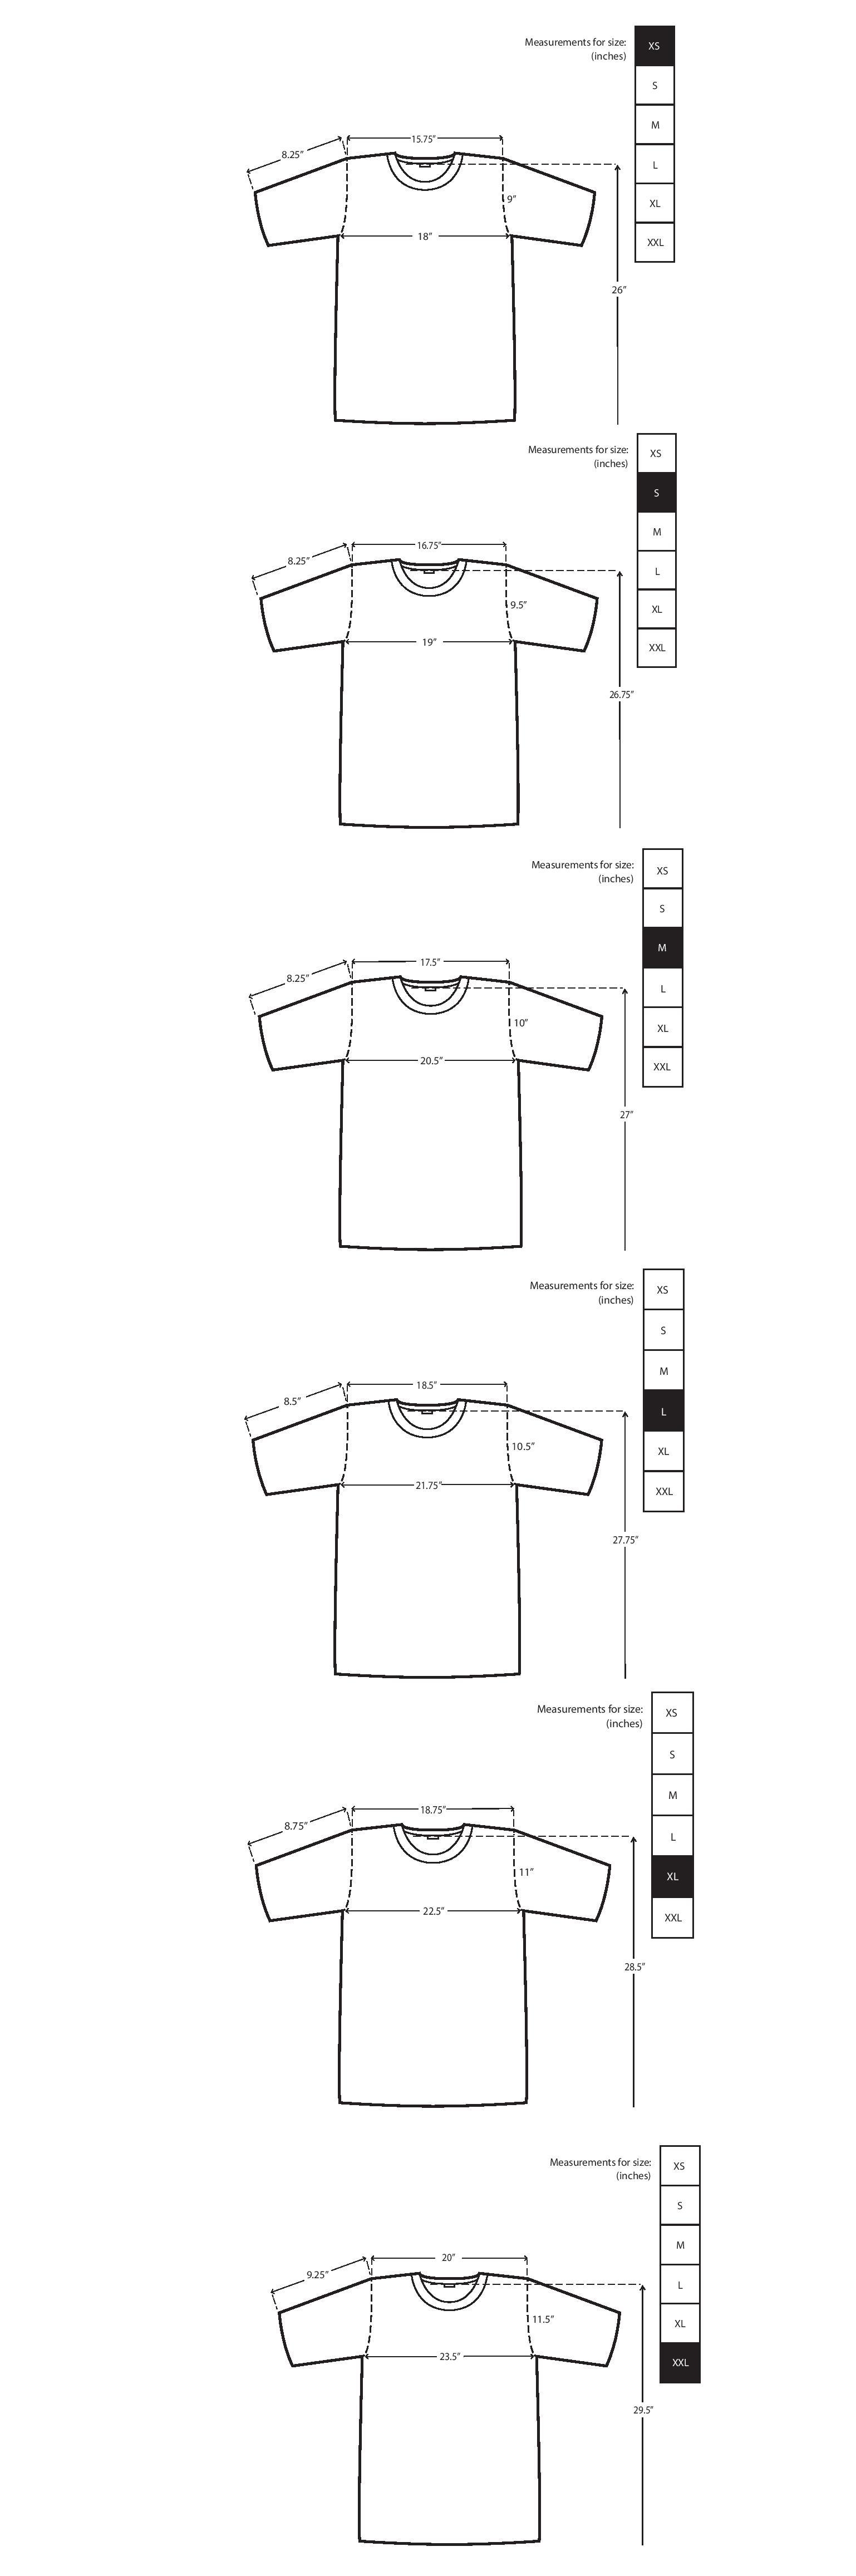 sunspelsizechartfinal-page-001.jpg